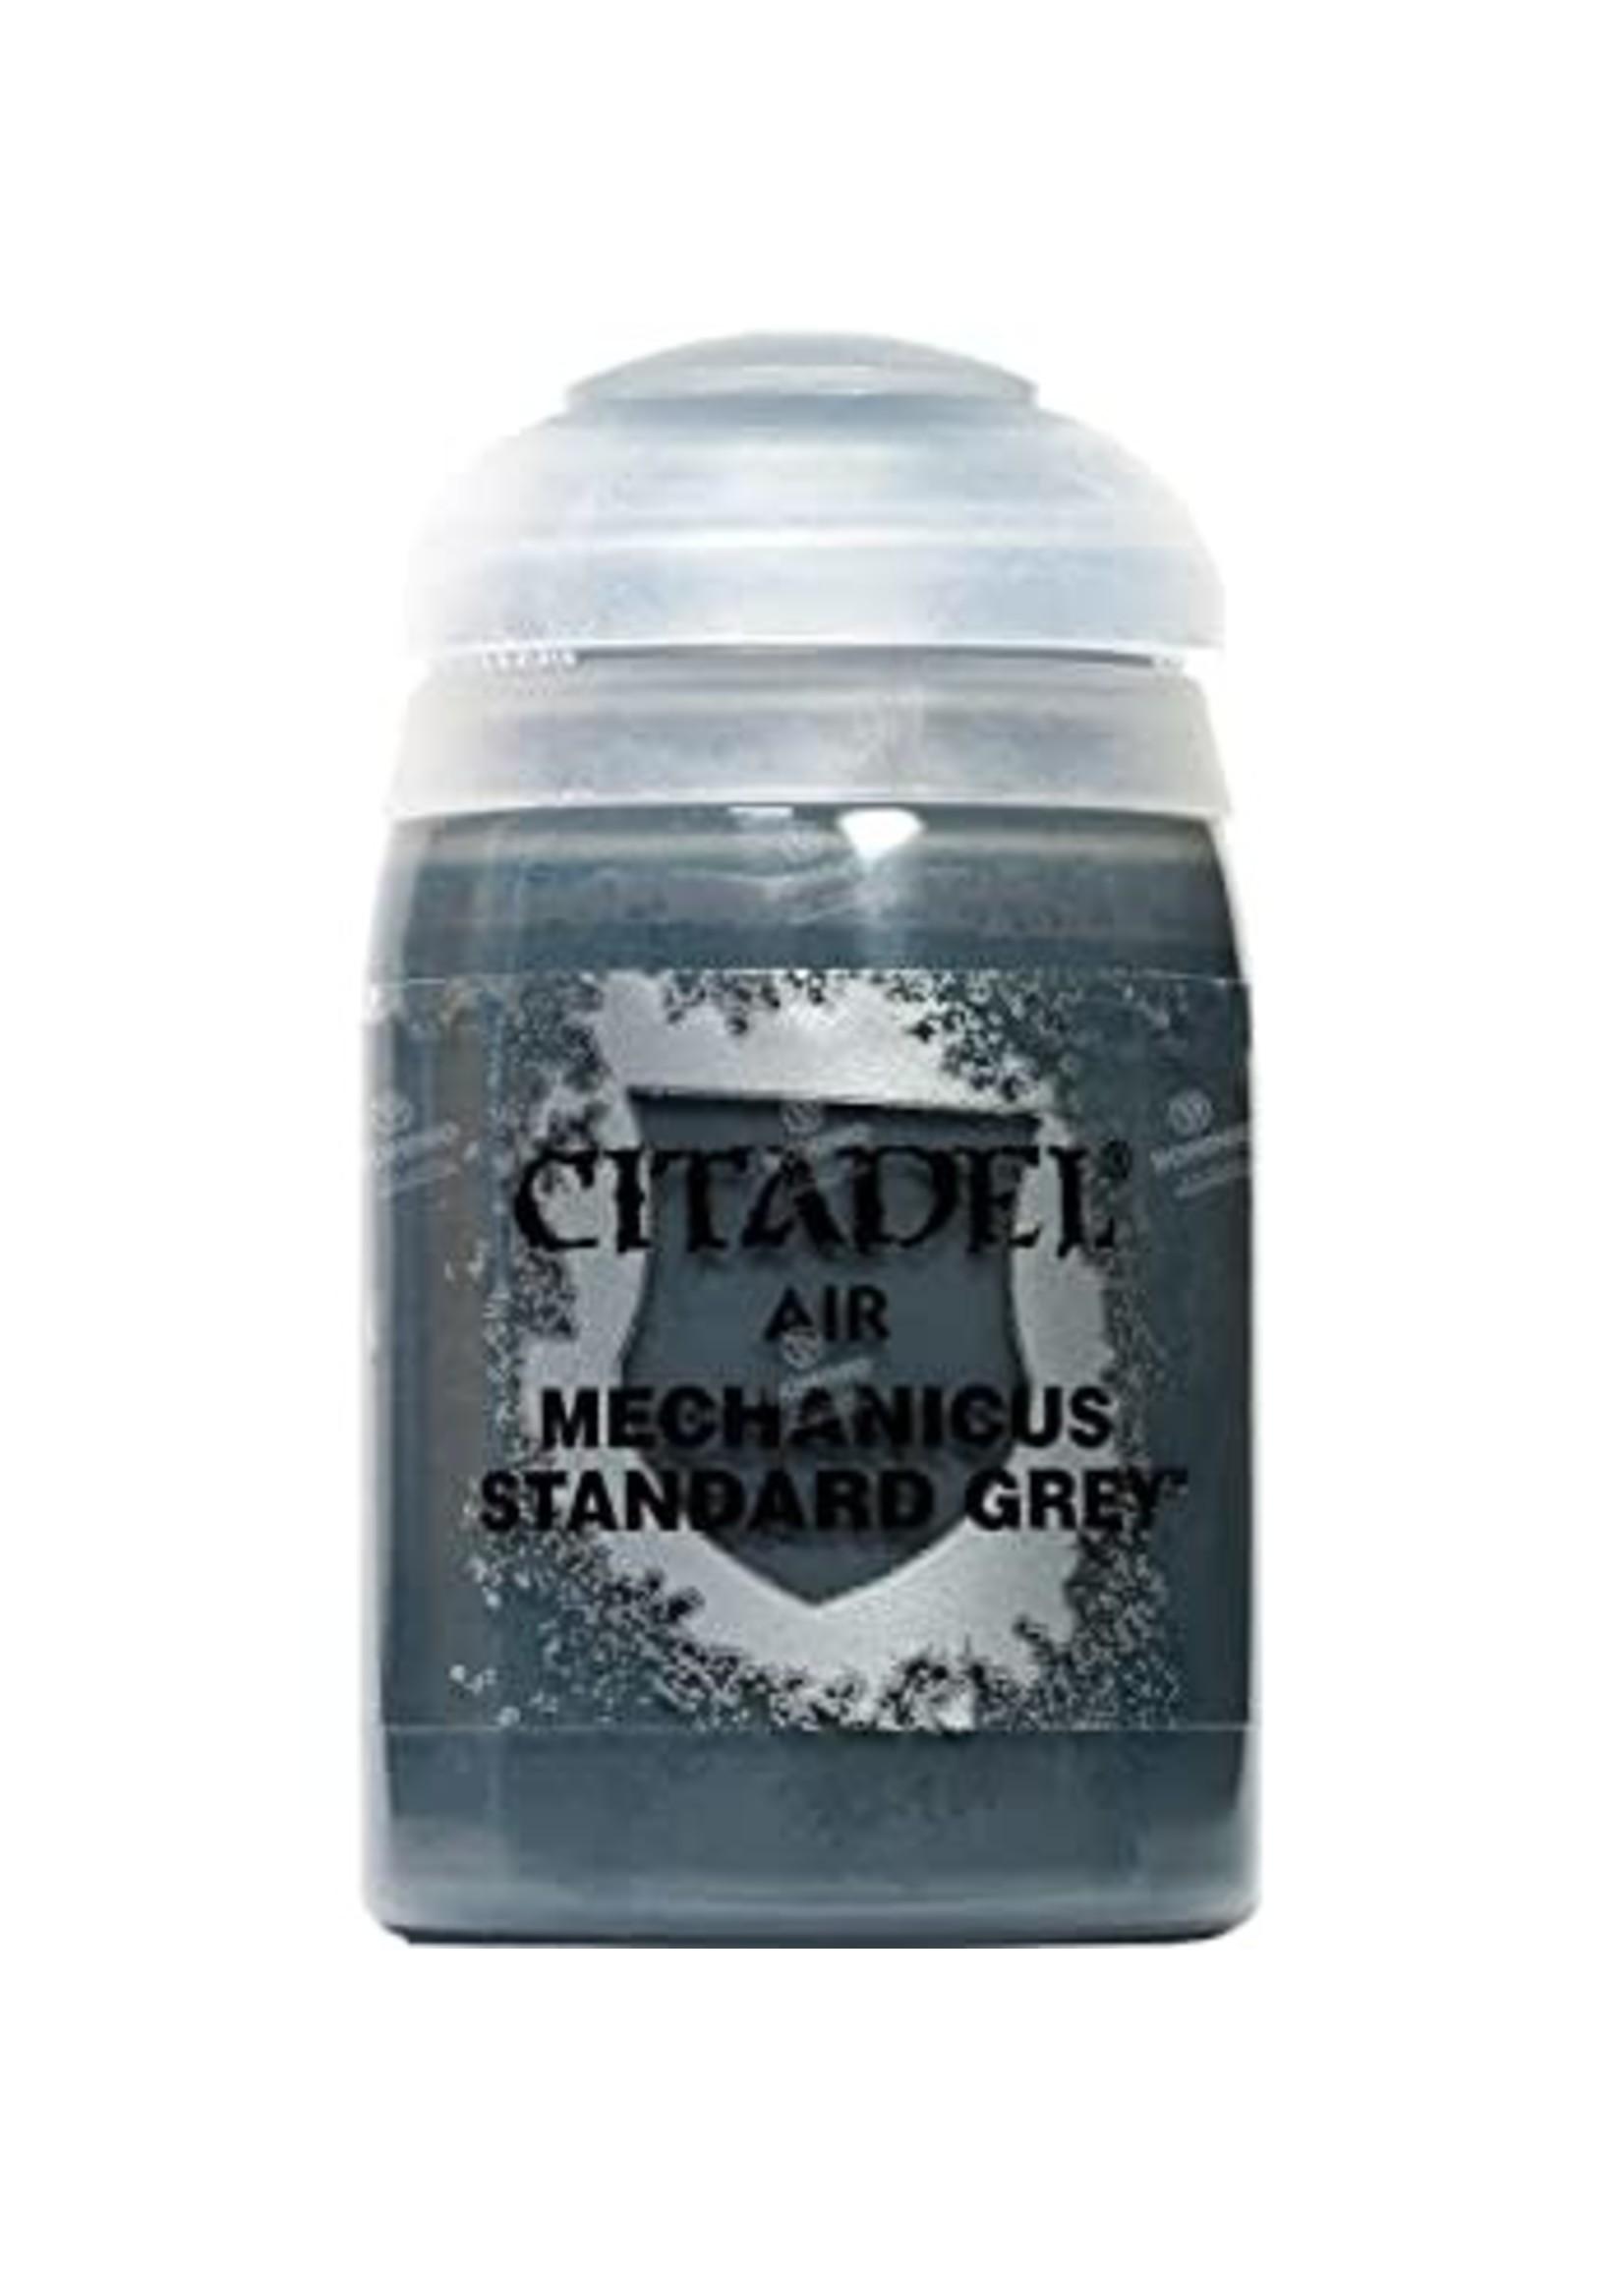 Games Workshop Citadel Paint: Mechanicus Standard Grey Air (24 ml)